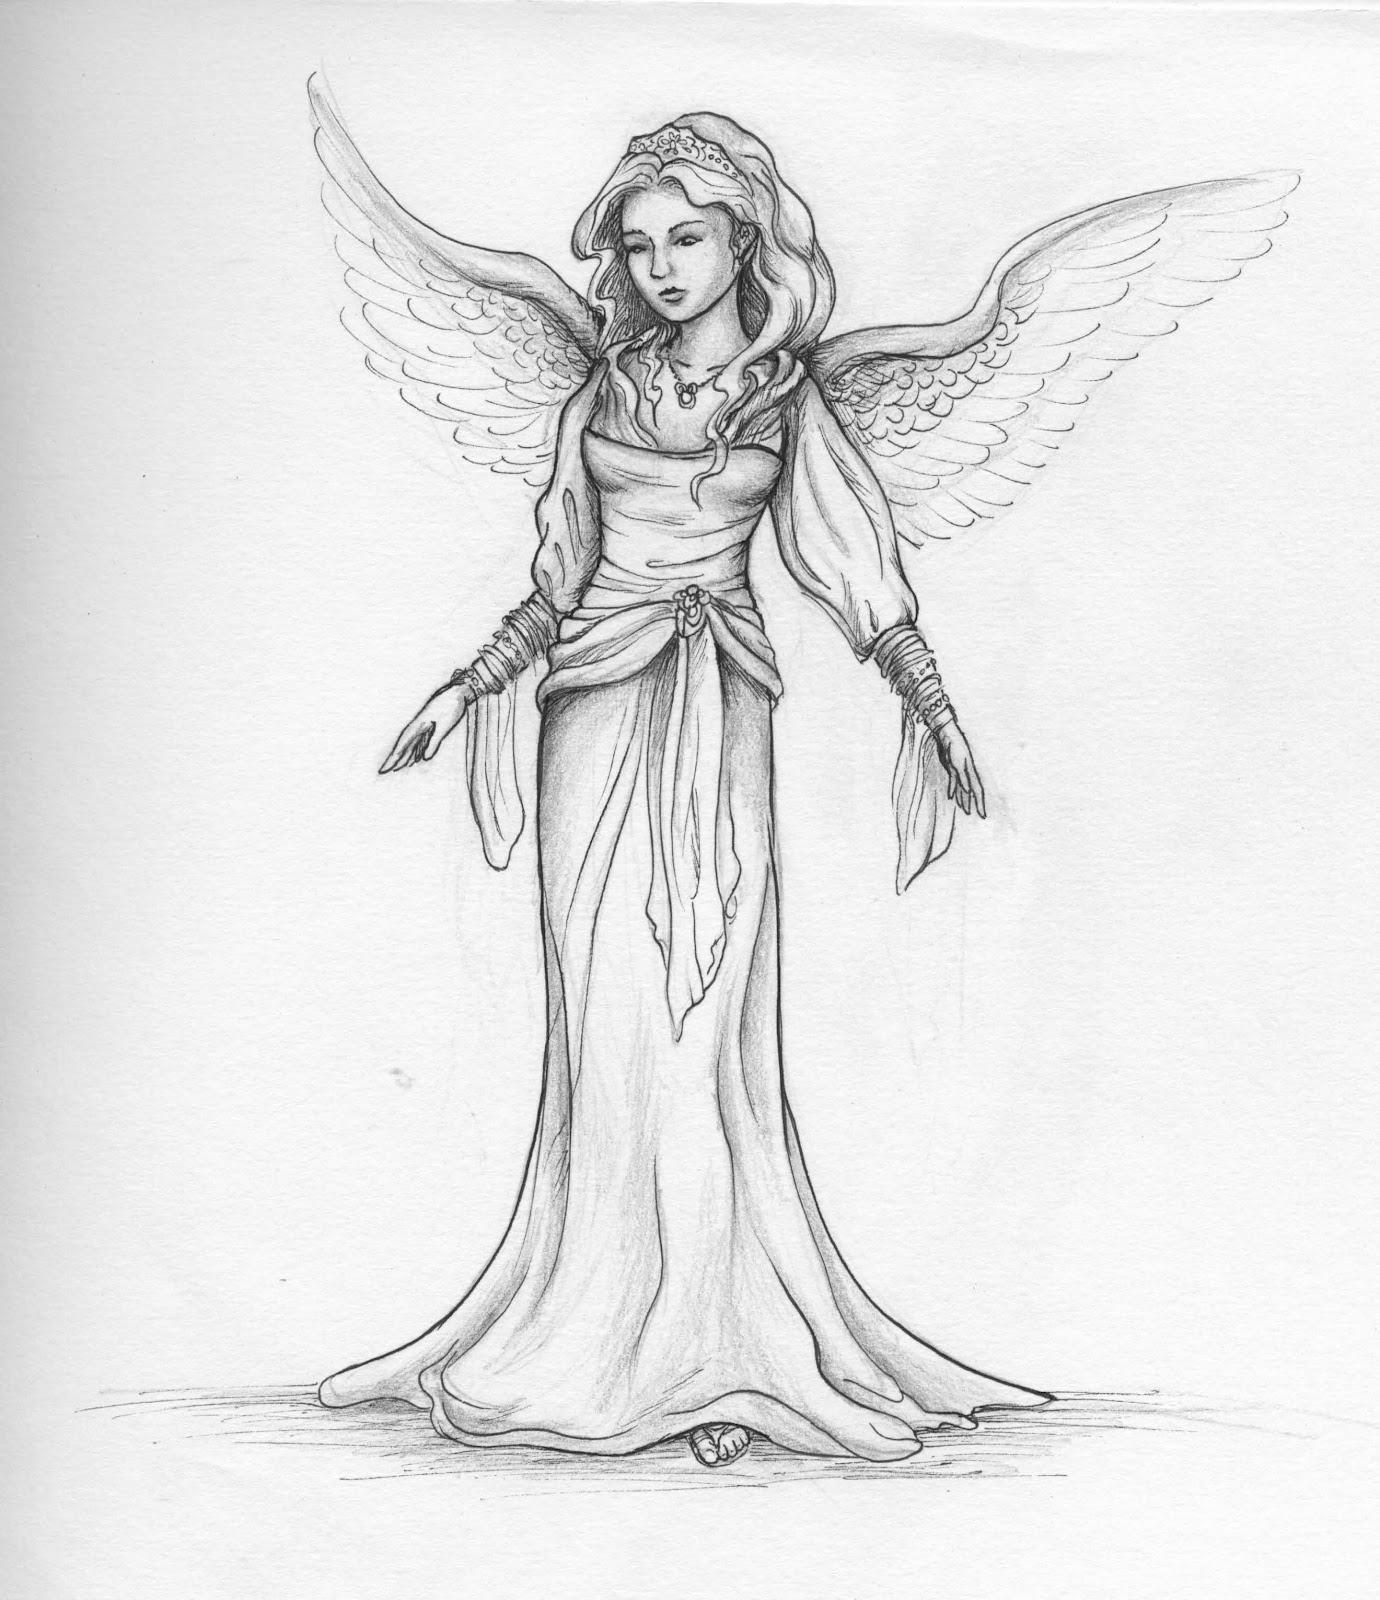 1380x1600 Pencil Drawings Pencil Drawings Of Angels